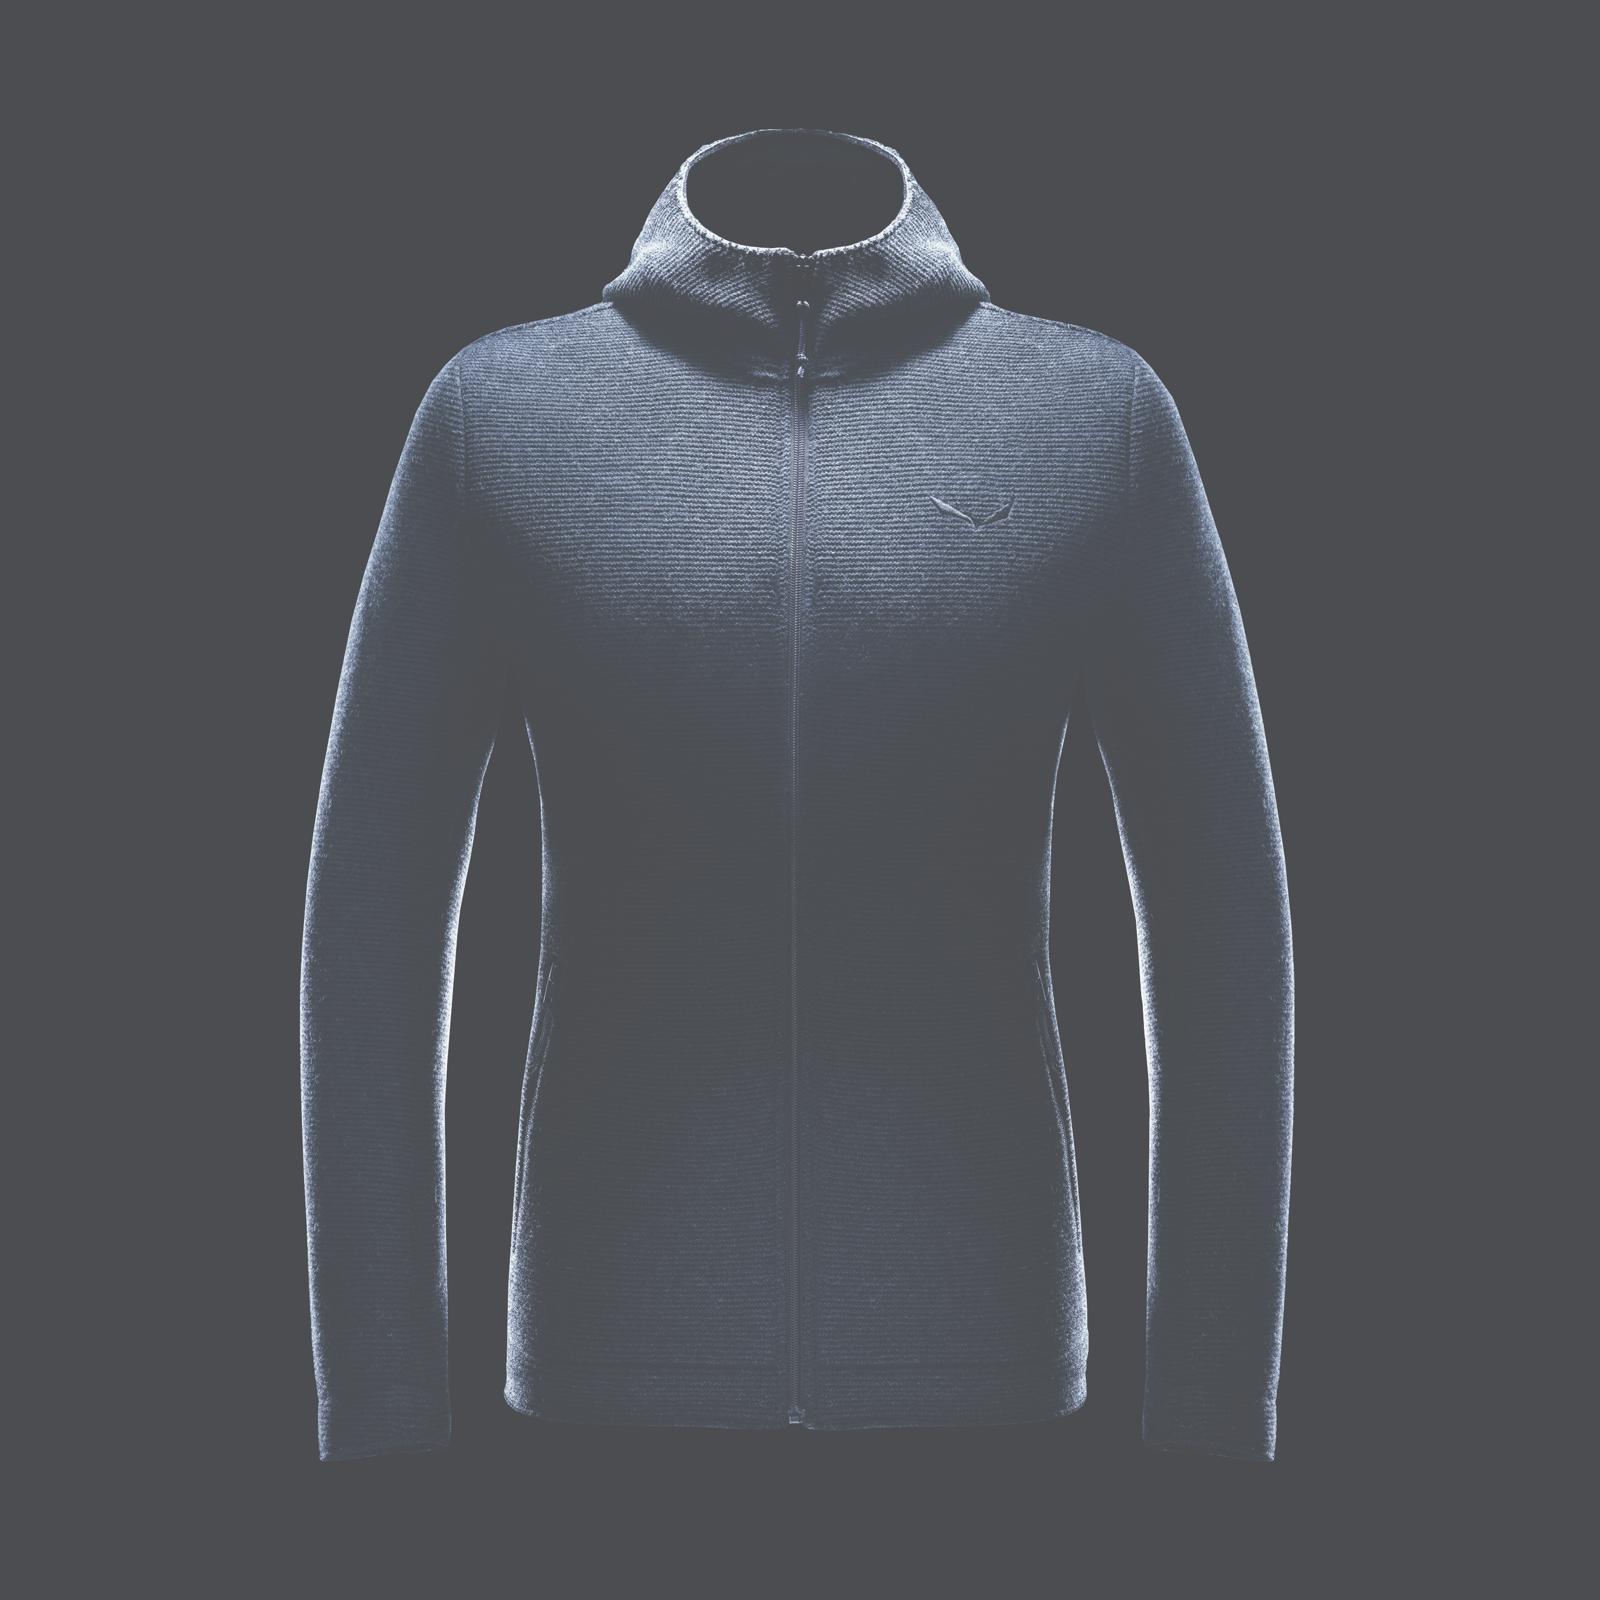 new style d23a5 2645b Salewa inventa il 'piumino di lana' | Skialper